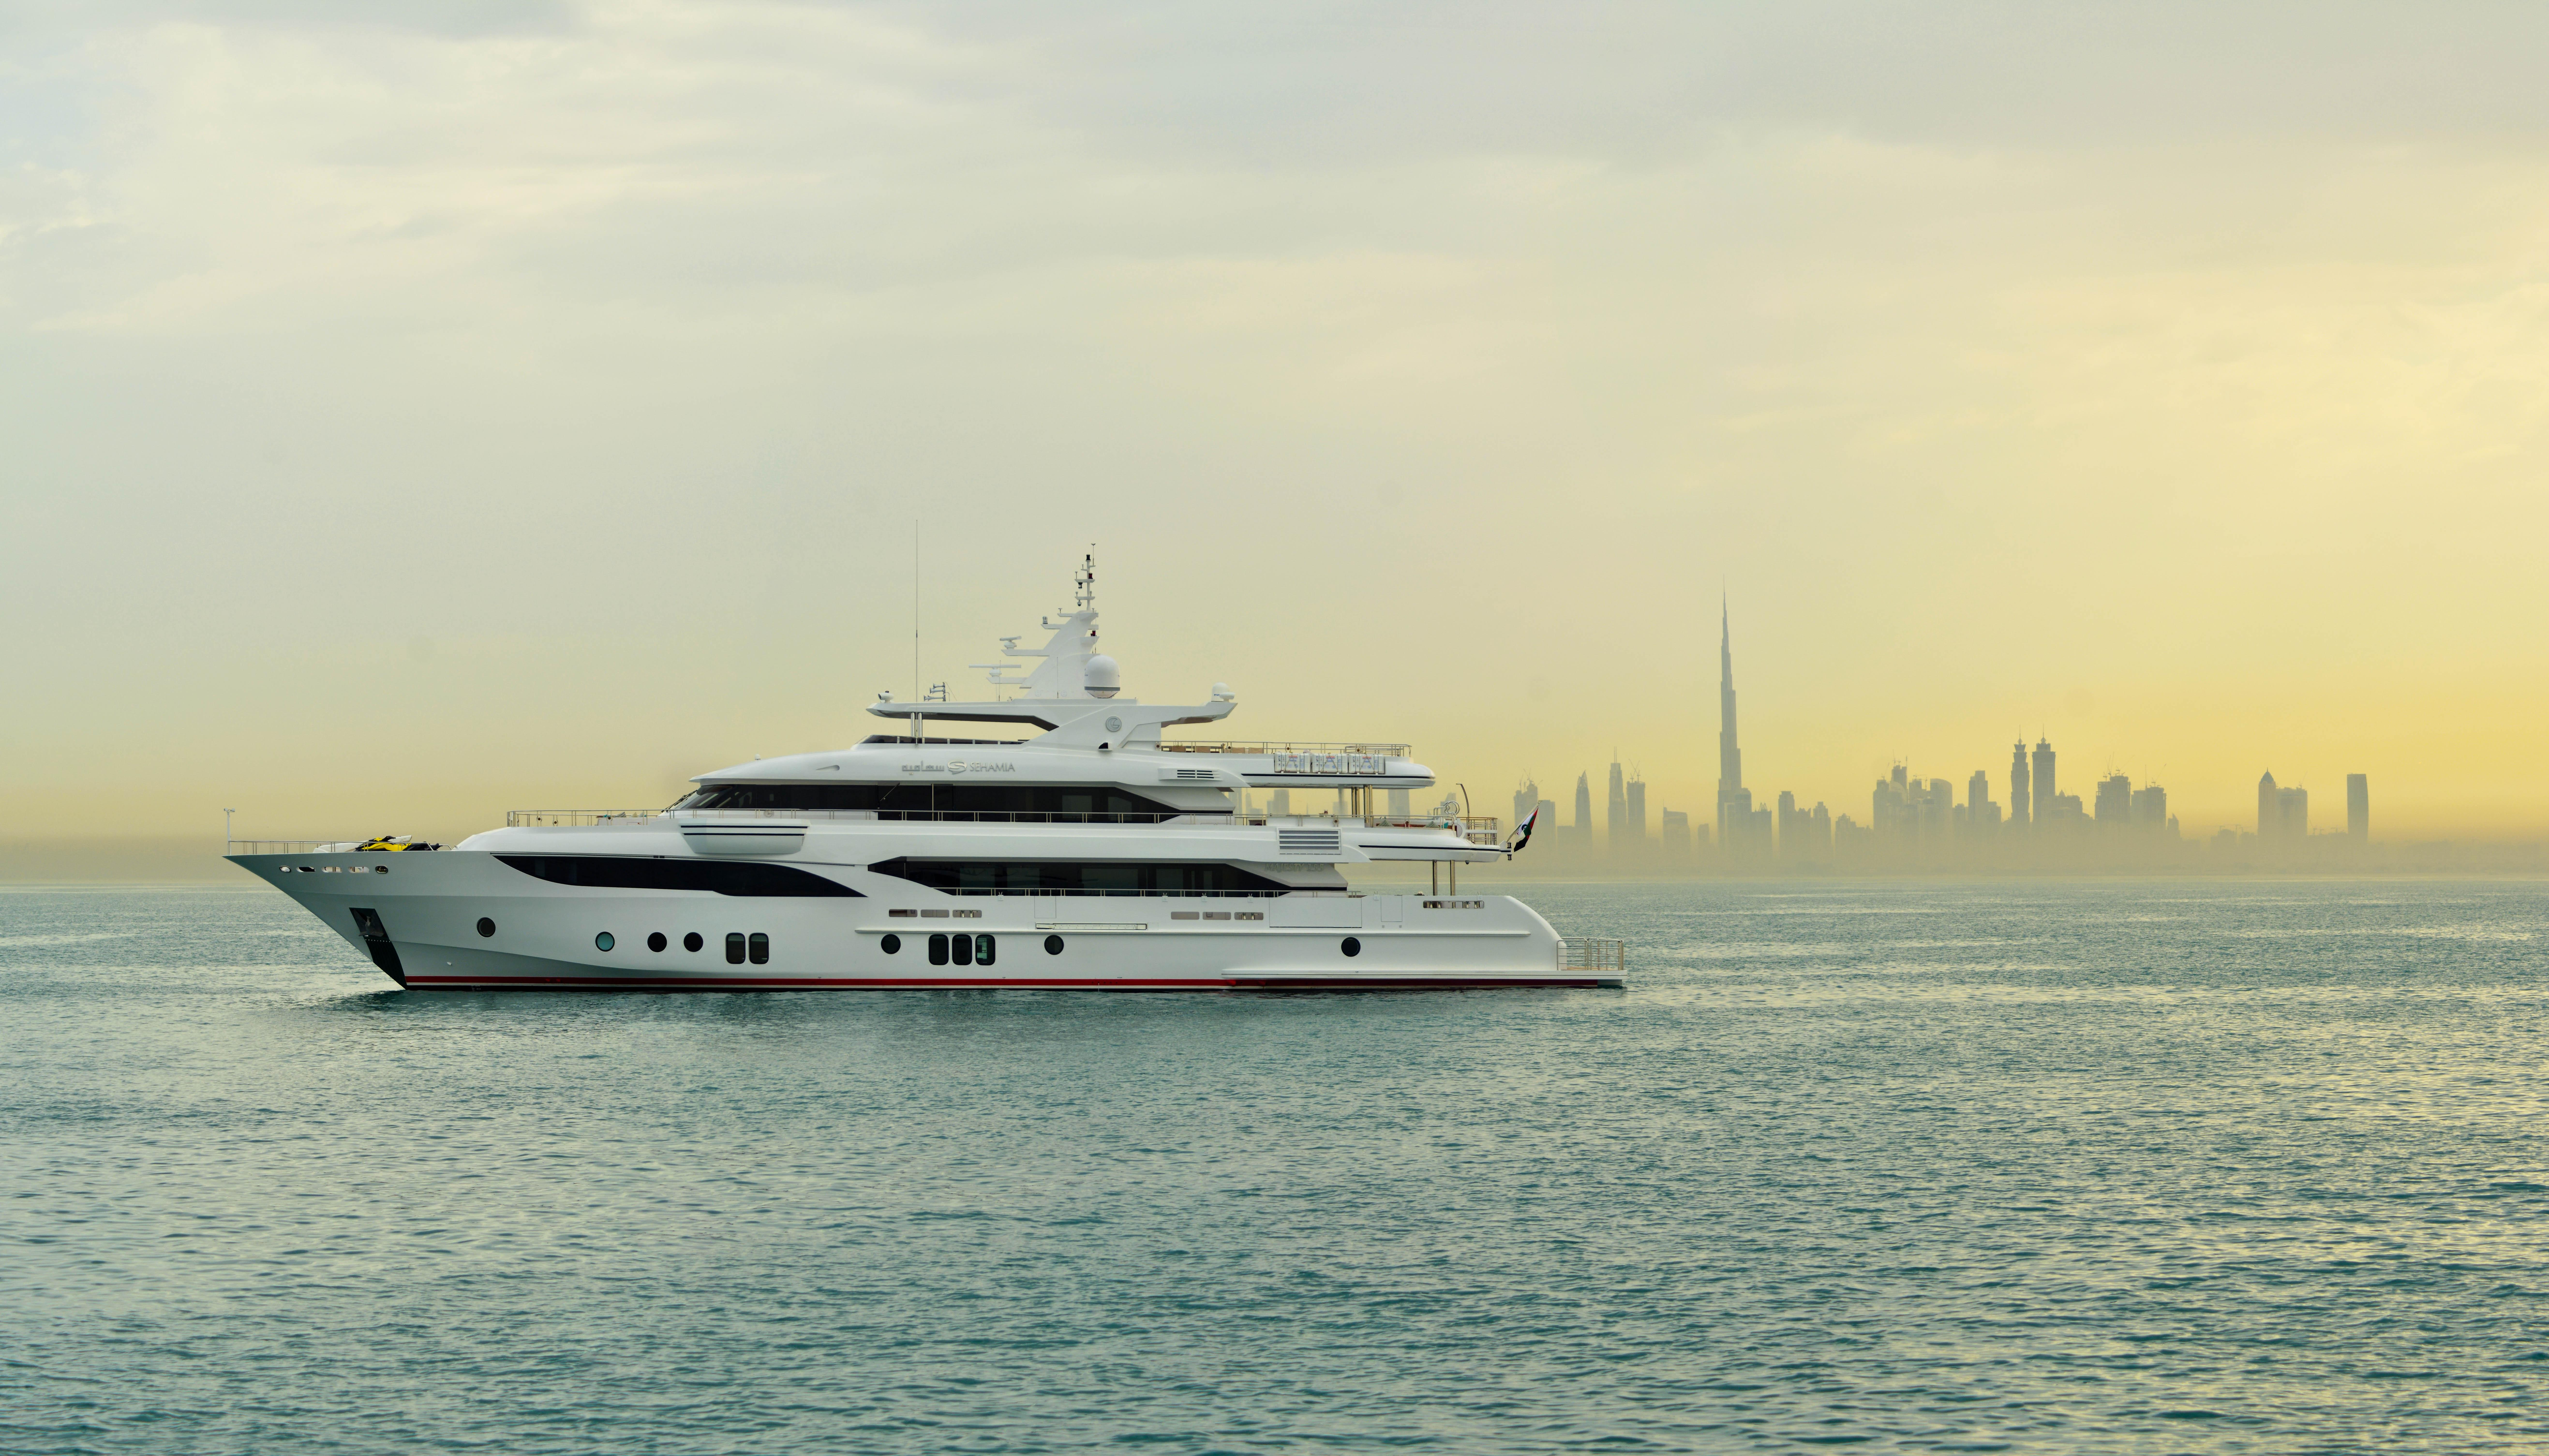 Majesty 155 - Offering Unequivocal Luxury